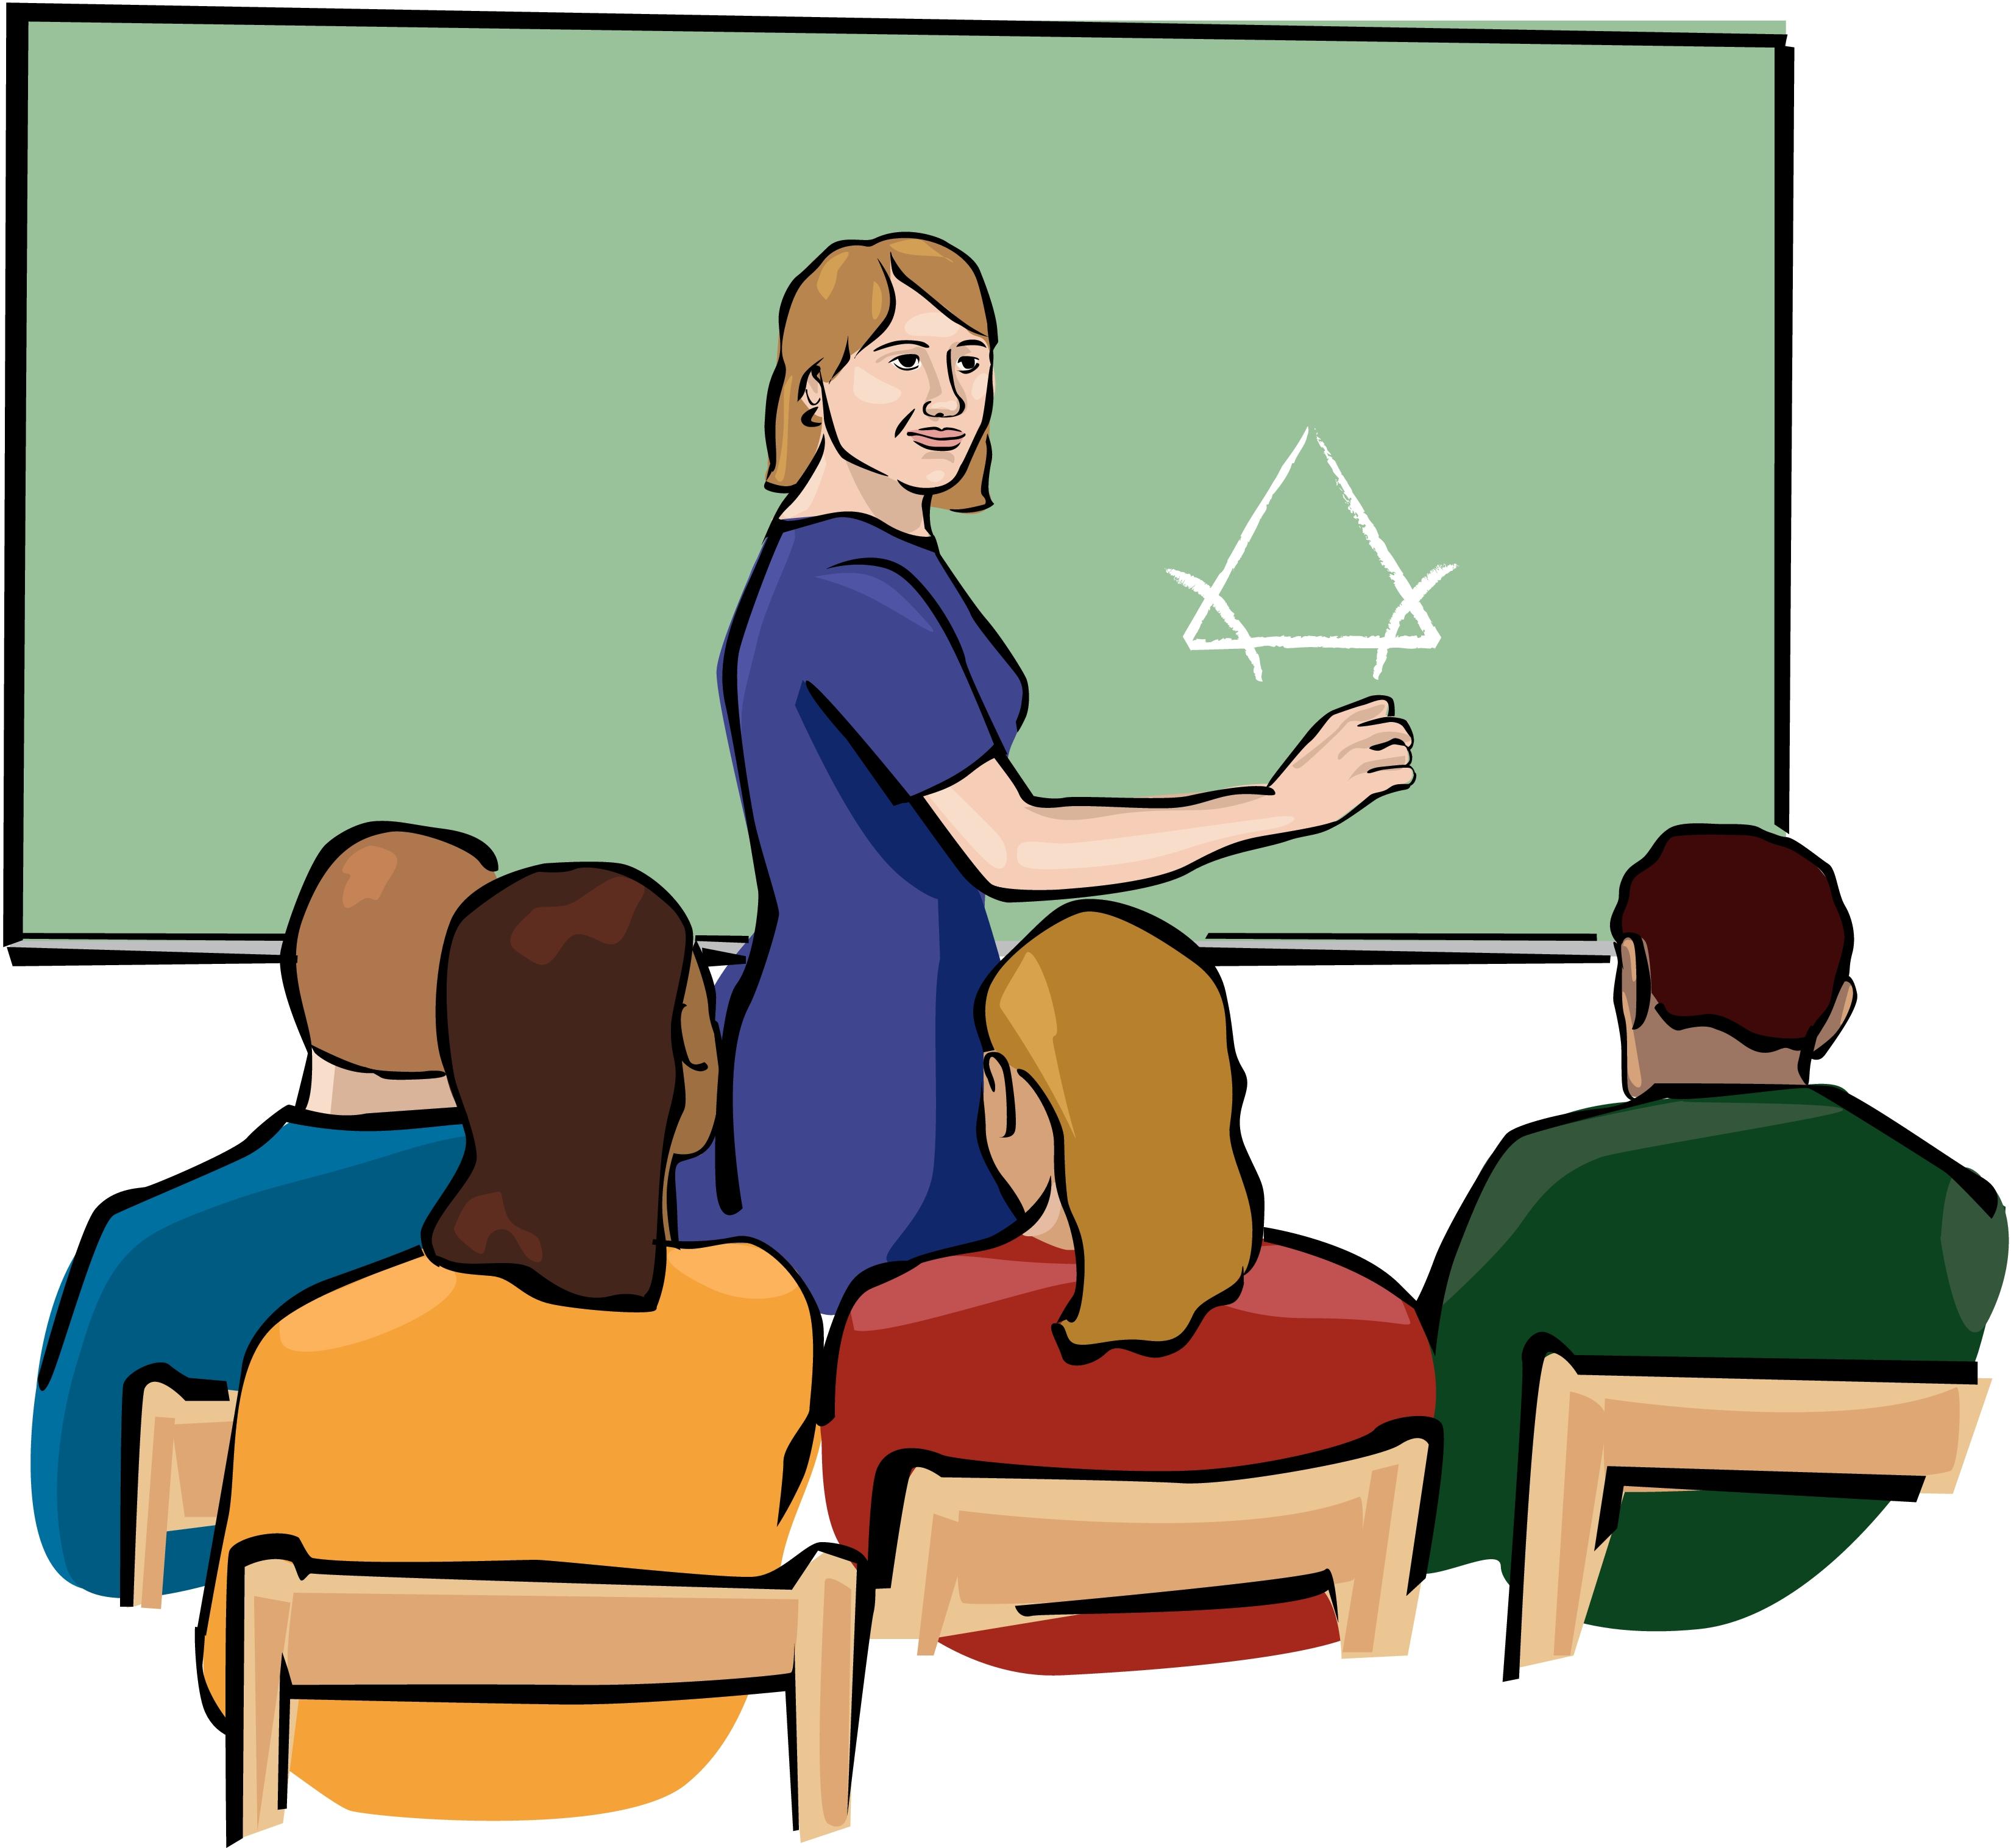 Teacher Teaching Student Clip Art N10 free image.